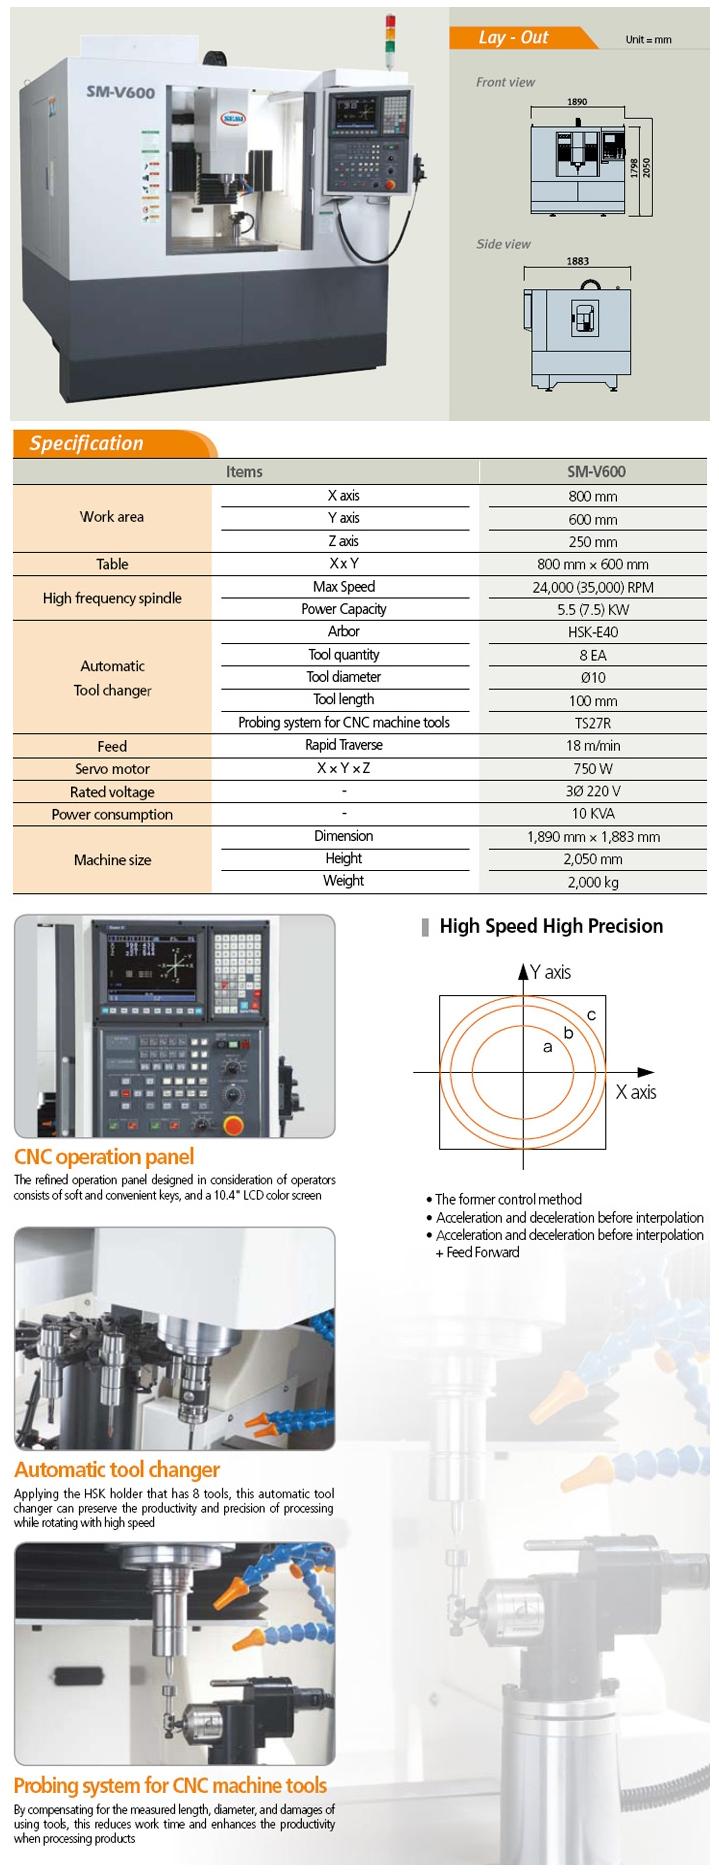 SEMI INFOTEX High-Speed Processing Machine SM-V600